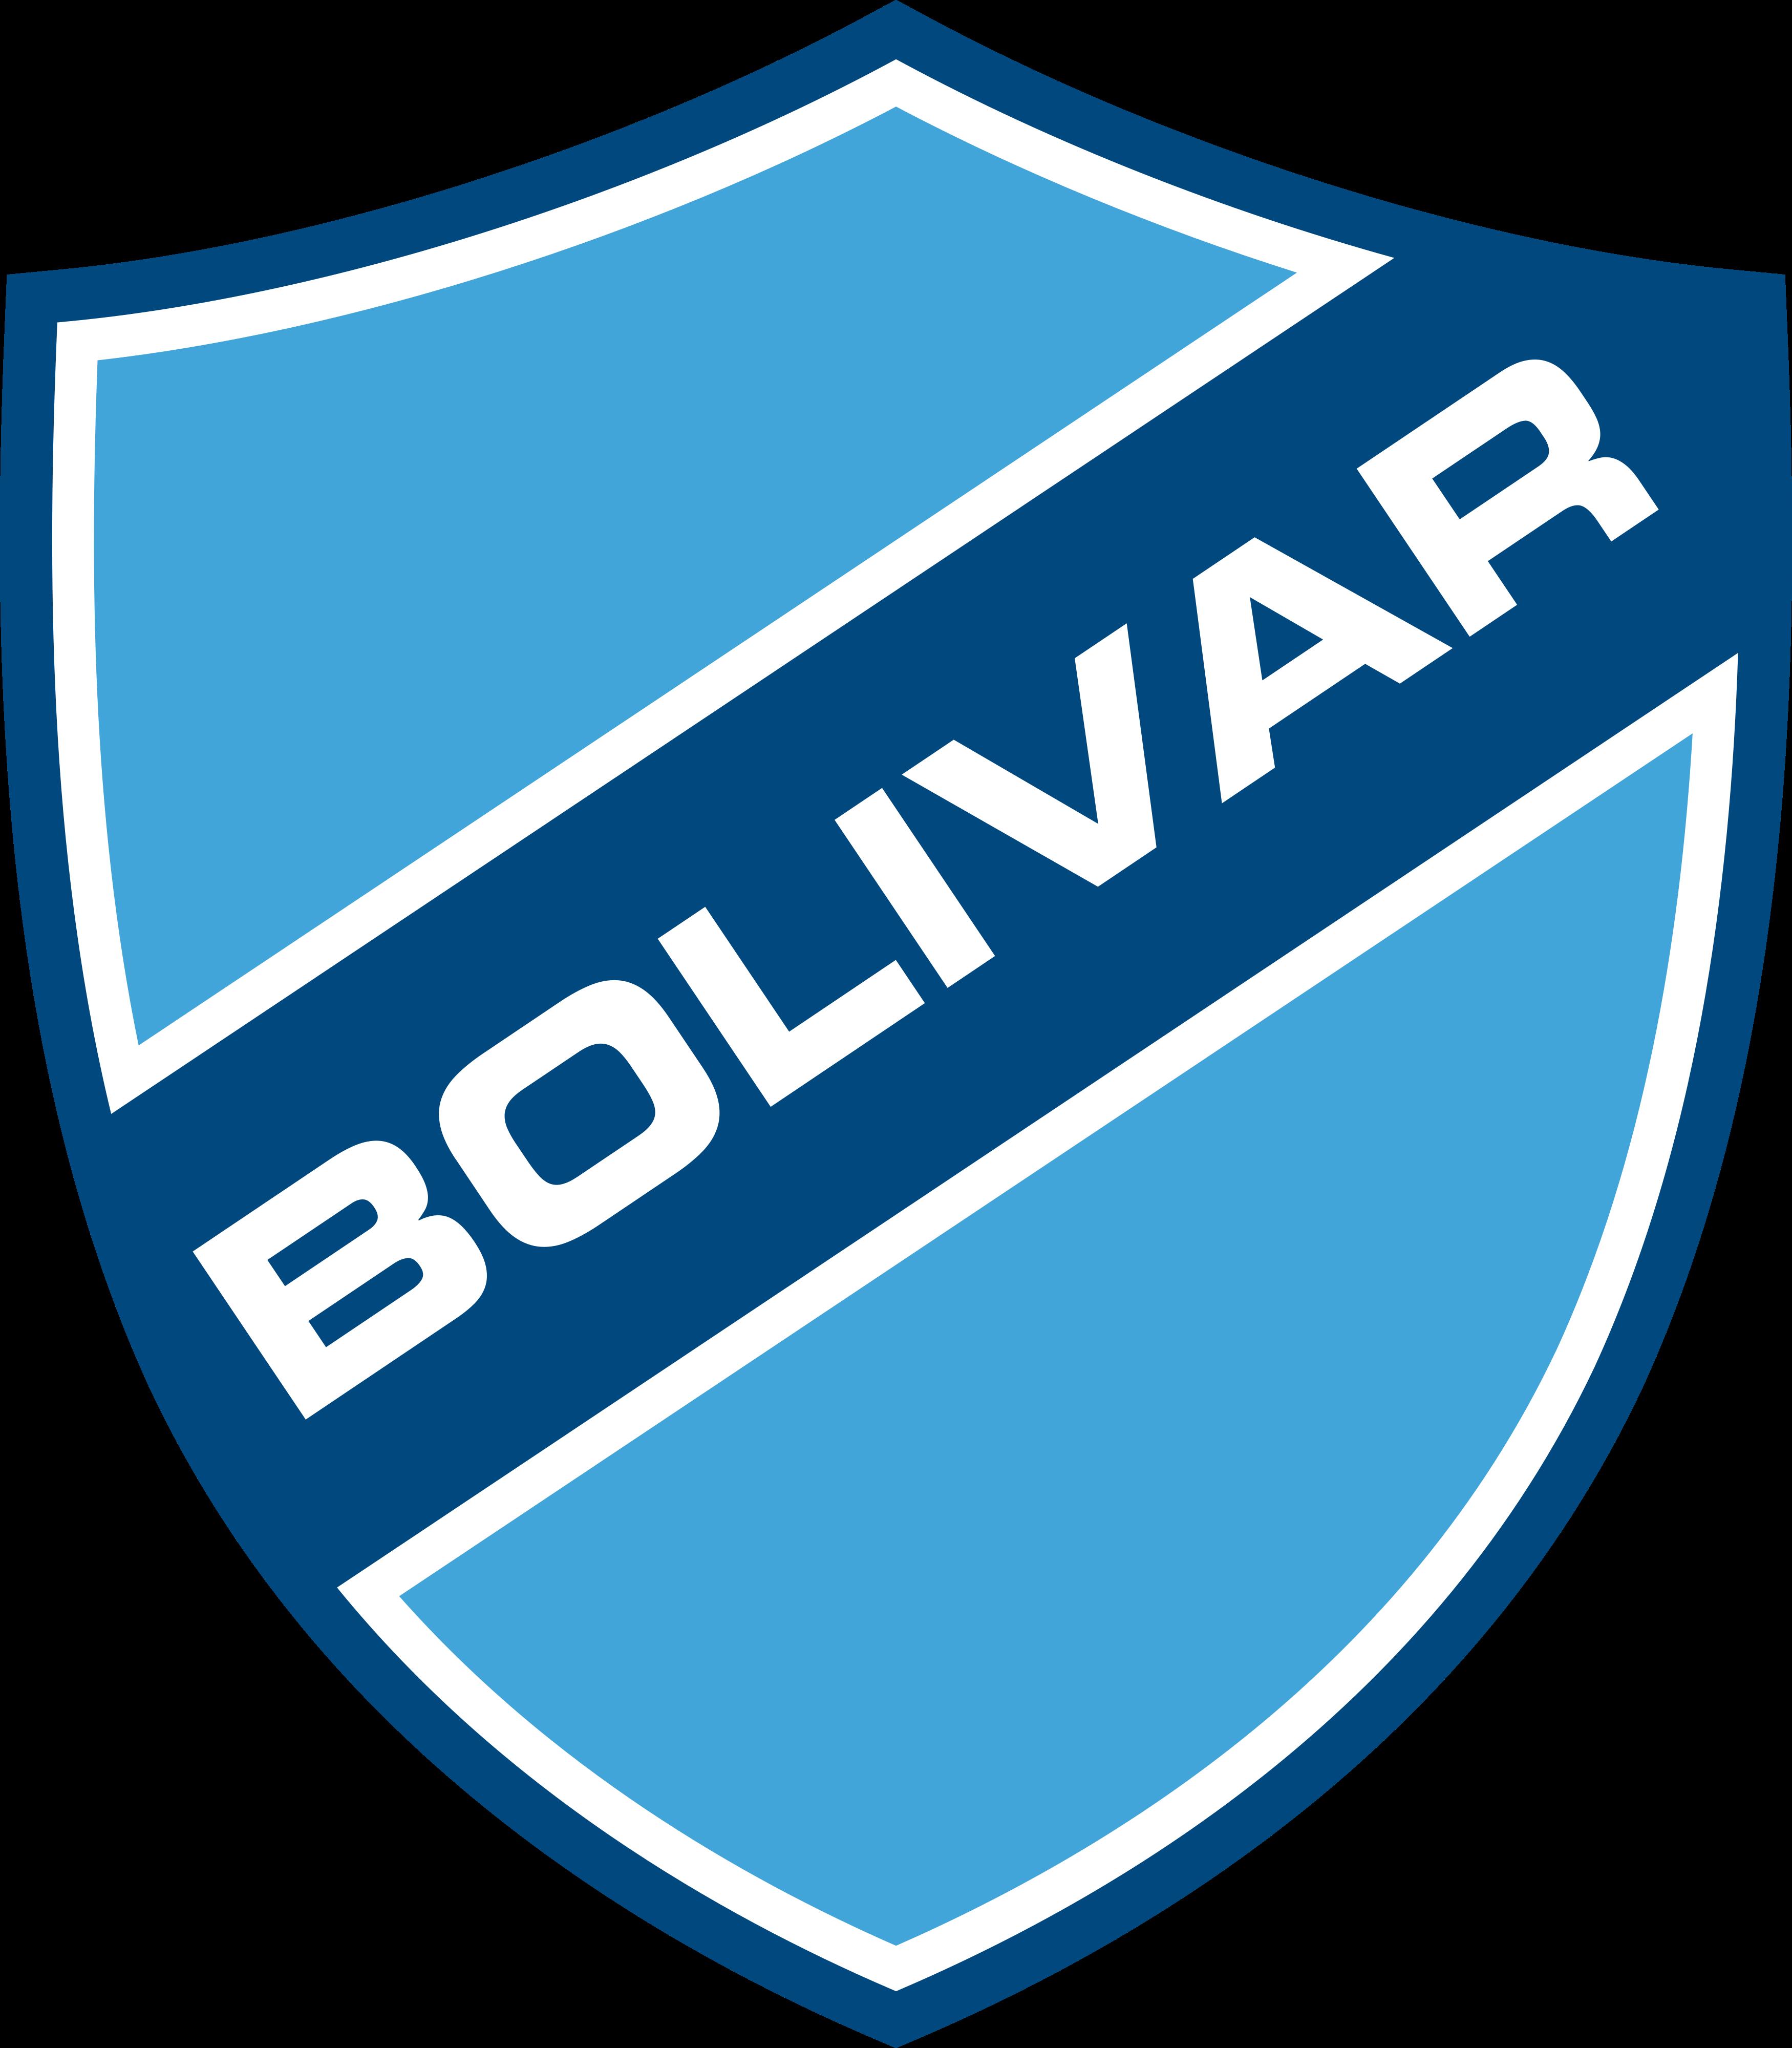 club bolívar logo - Club Bolívar Logo - Escudo